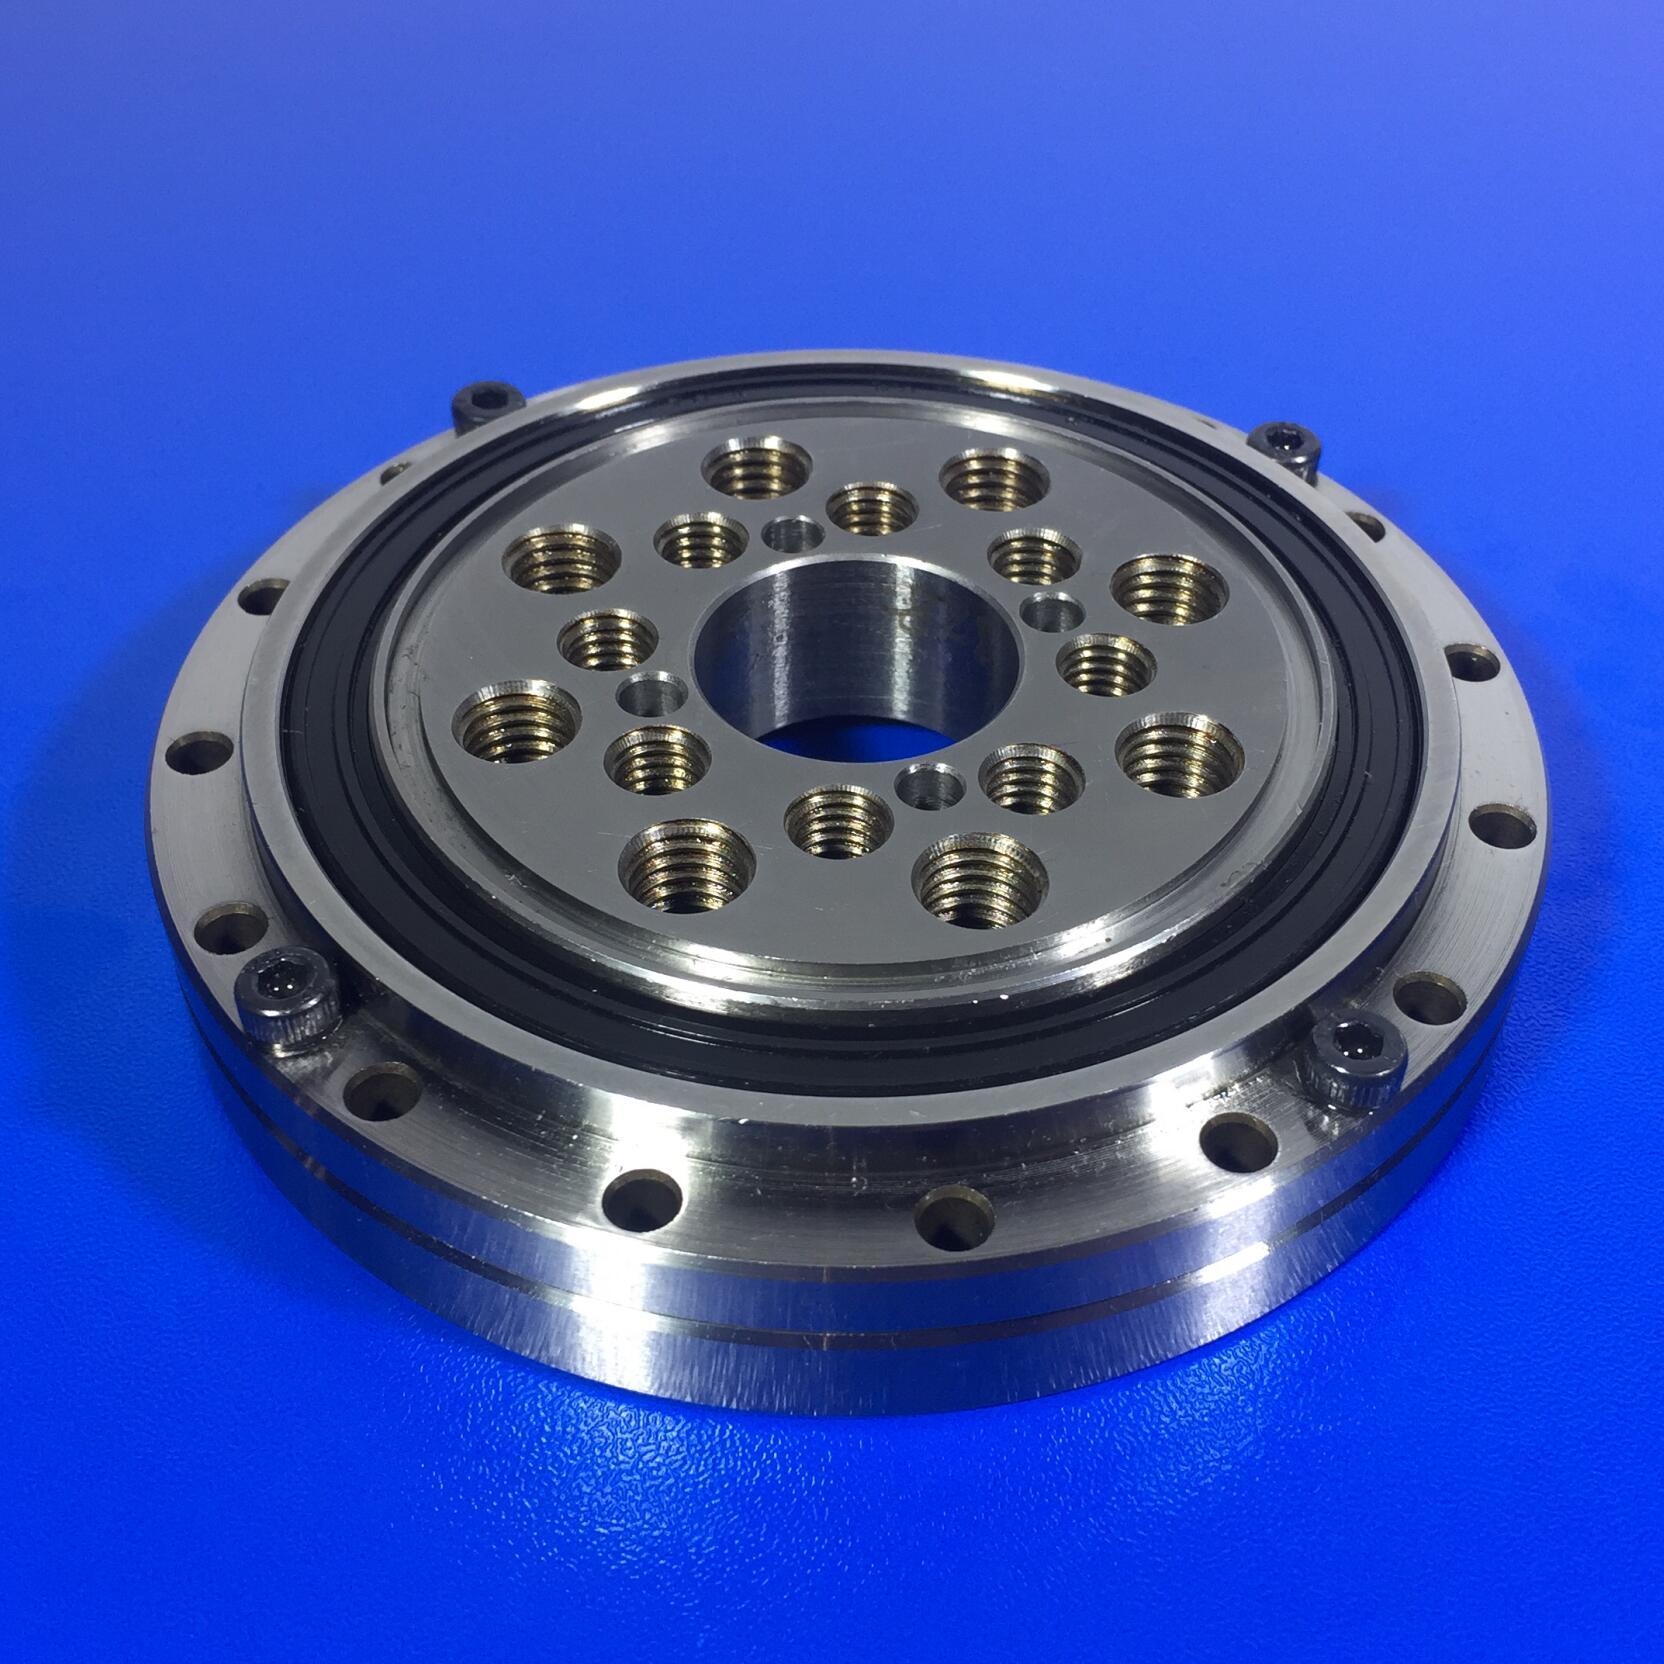 CSF-40 , CSG-40 , CRB40-126 Cross Roller Bearing For CSF/CSG Harmonic Drive Gear Speed Reducer-TLANMP Brand Precison Bearings